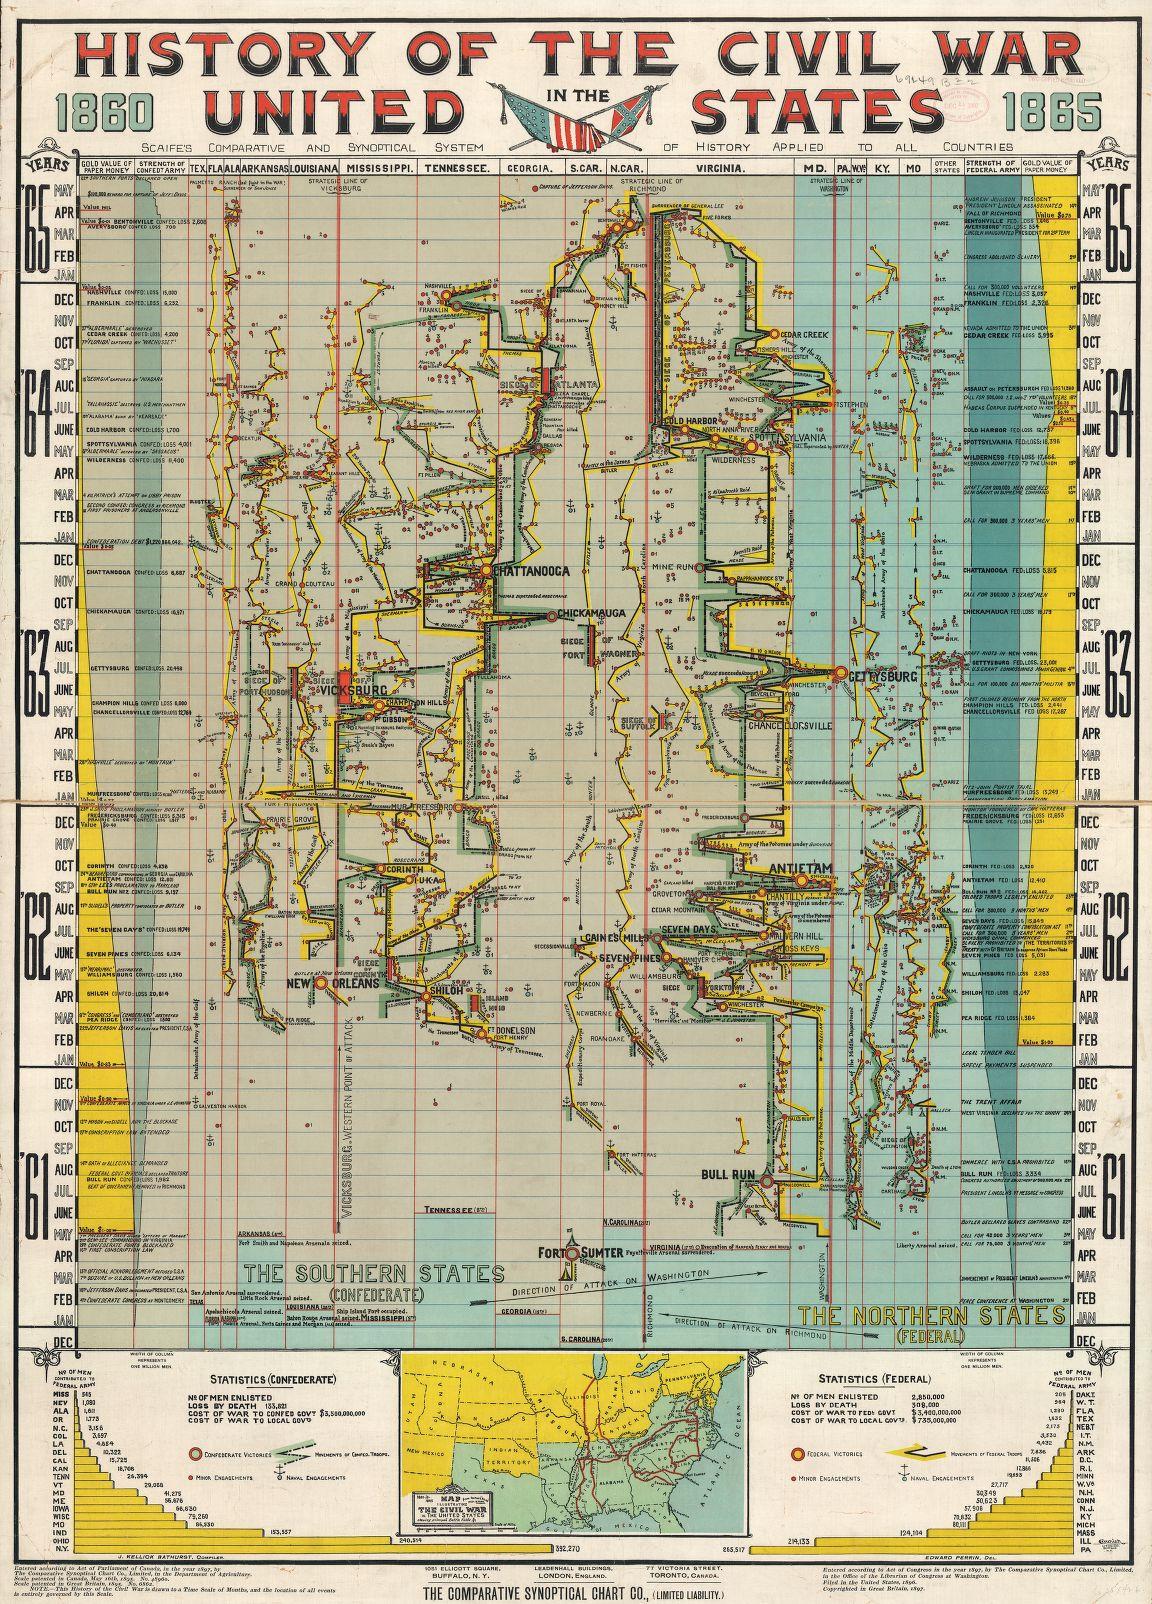 JF Ptak Science Books A Beautiful Timeline The US Civil War - Us timeline map